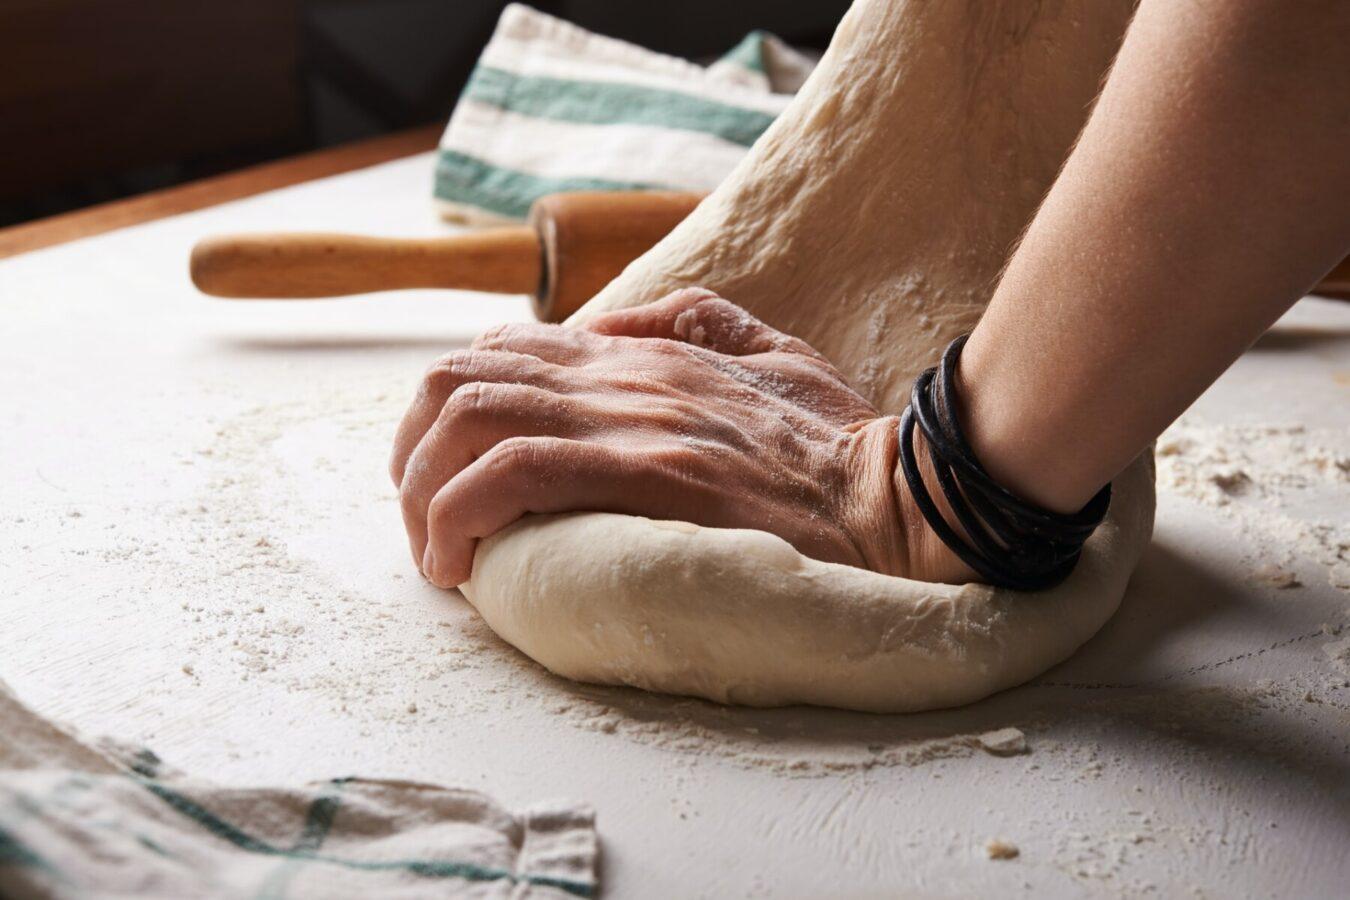 Pizza maker kneading dough